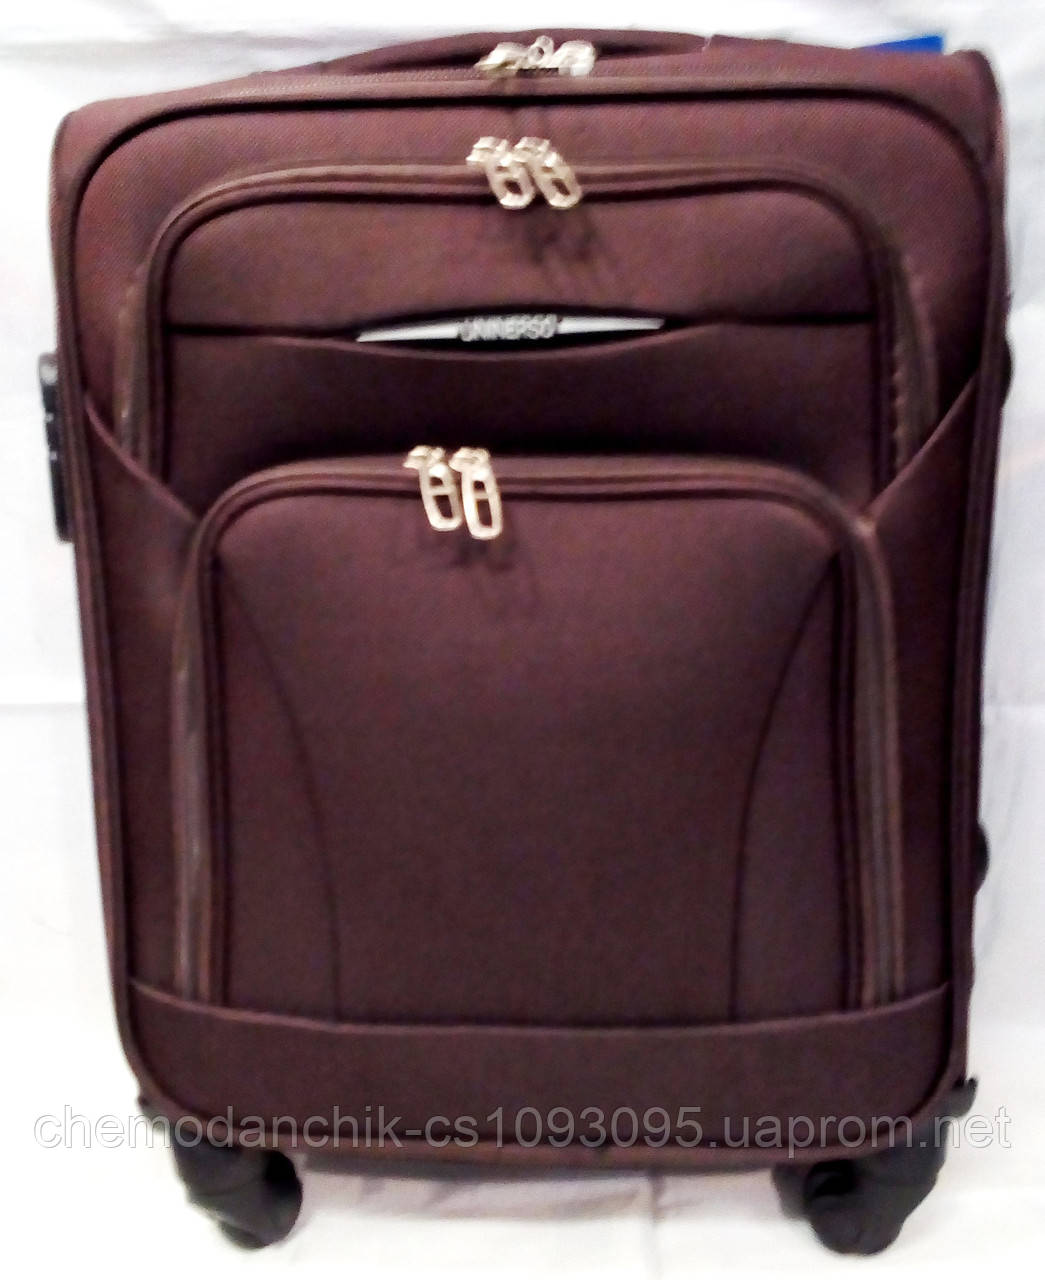 Чемодан Lovedream маленький 542-50 коричневый, цена 772 грн., купить ... 18fa013e46b